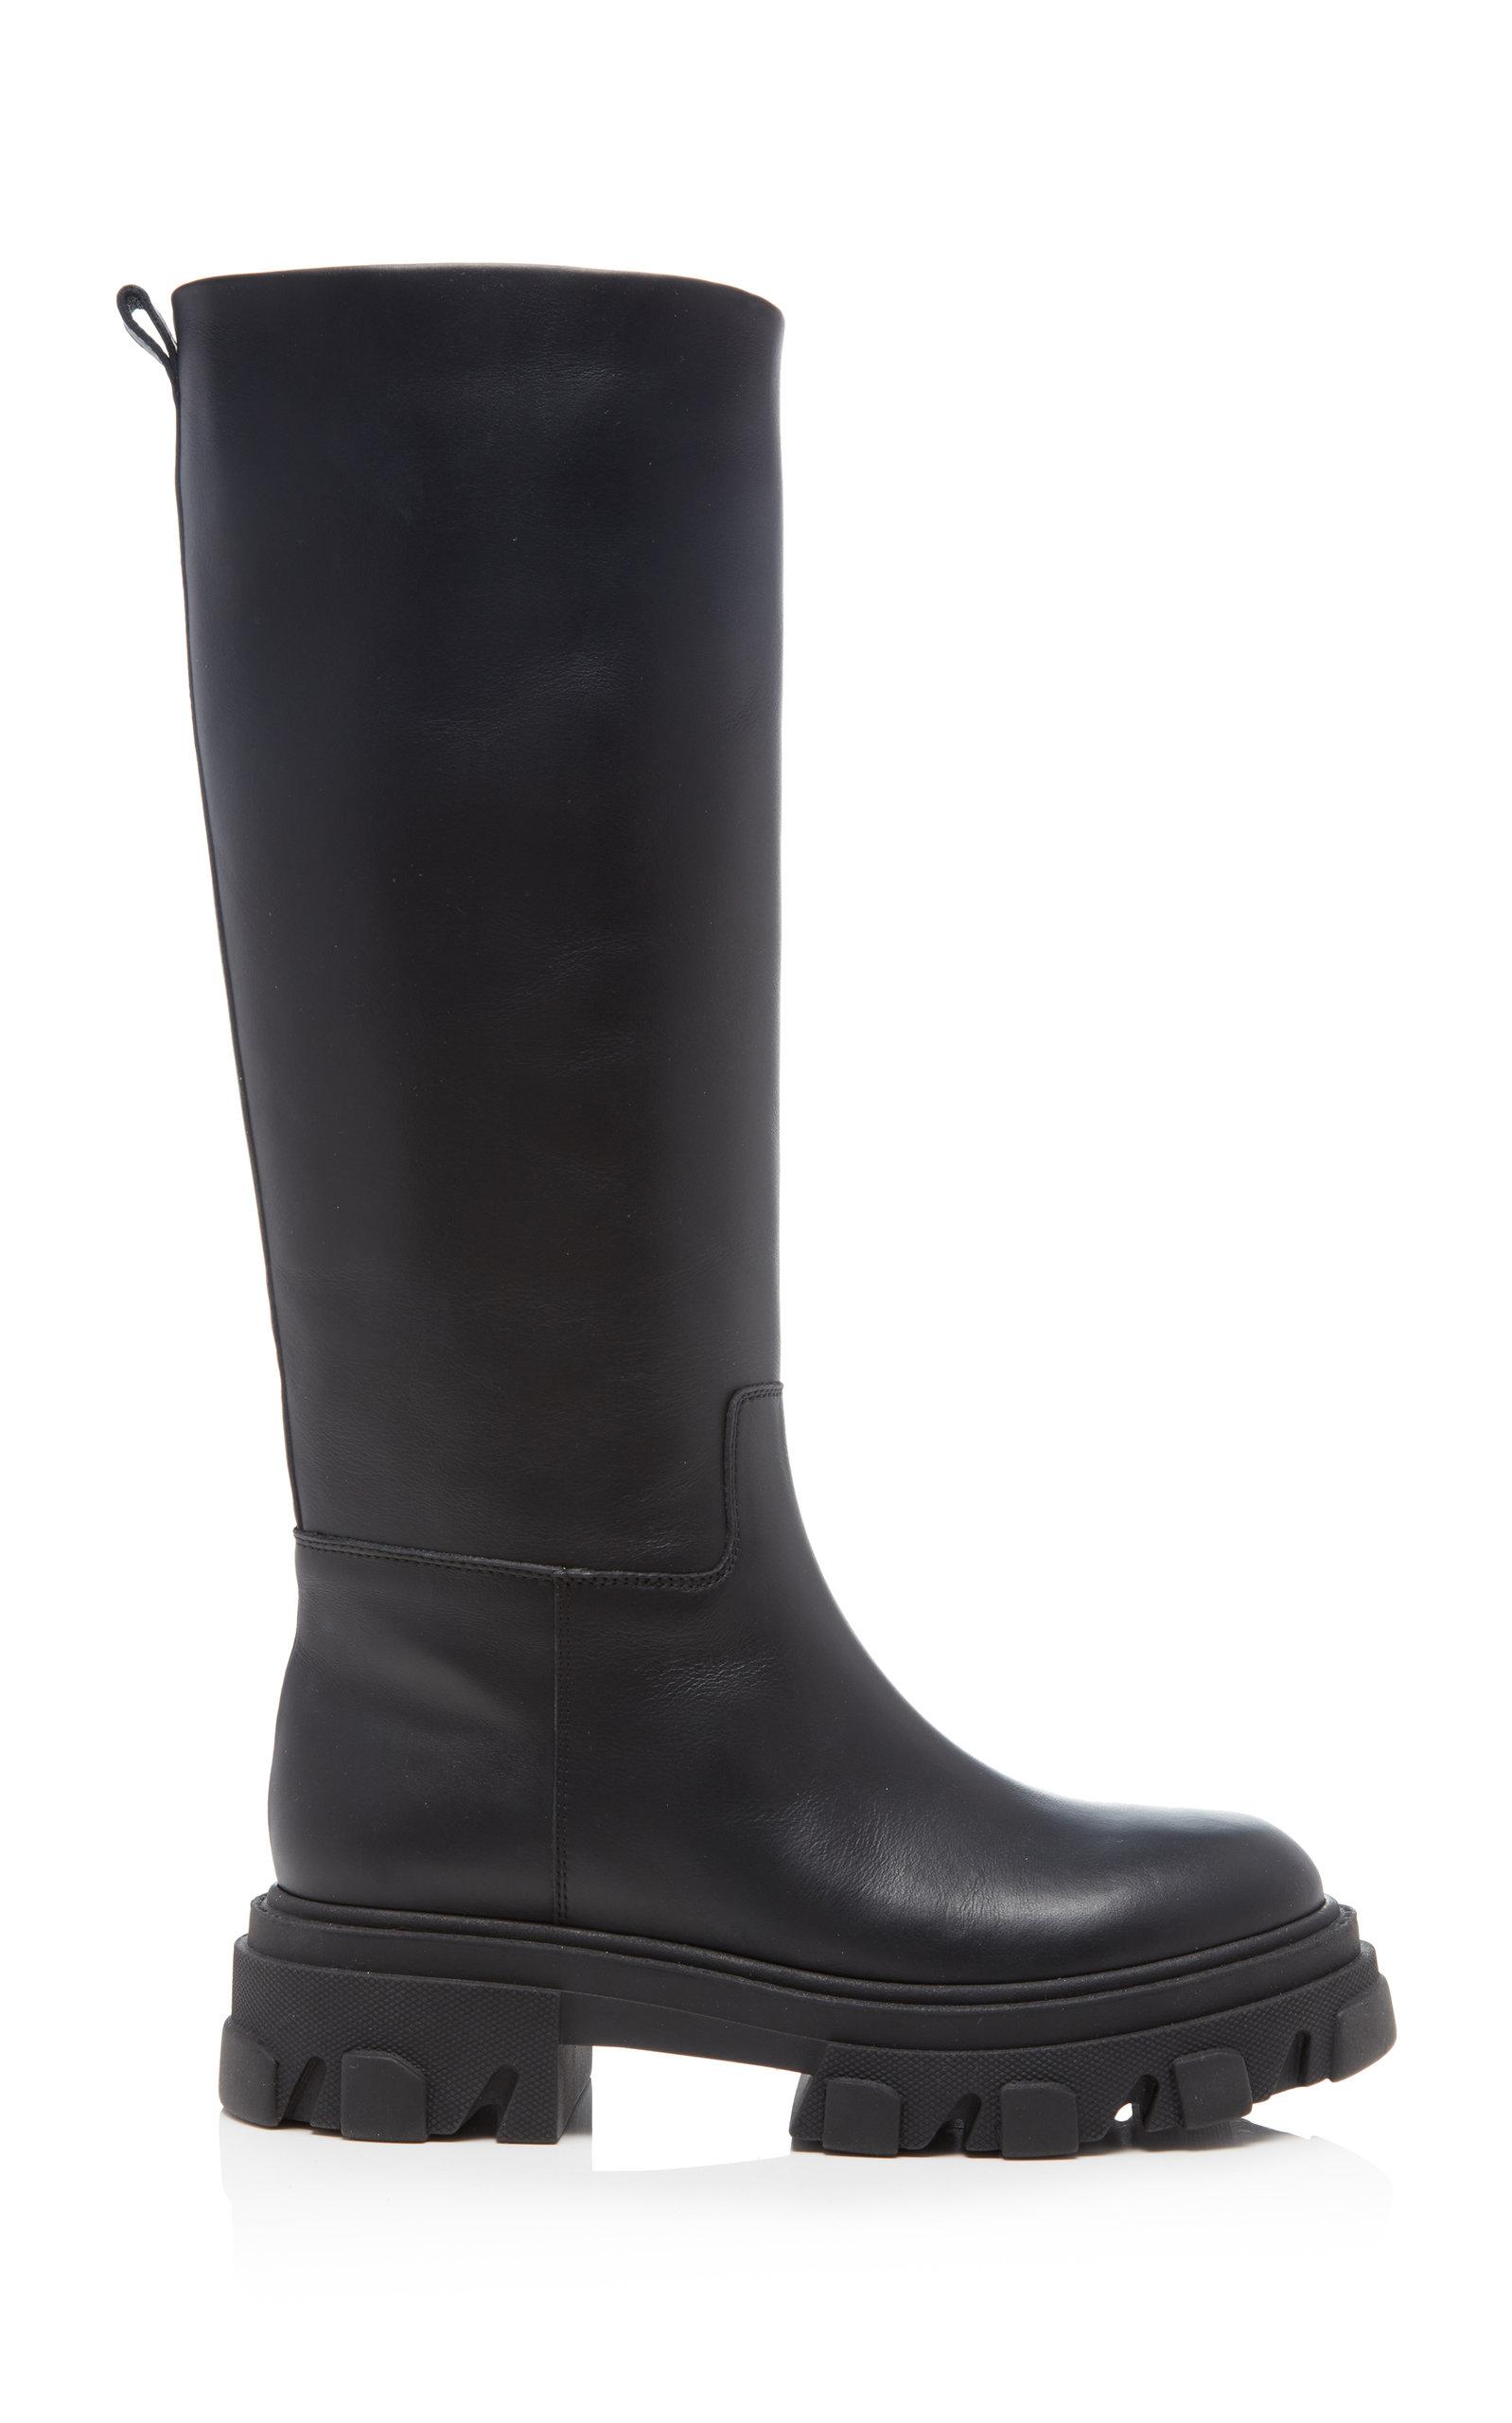 Women's Tubular Leather Knee Boots